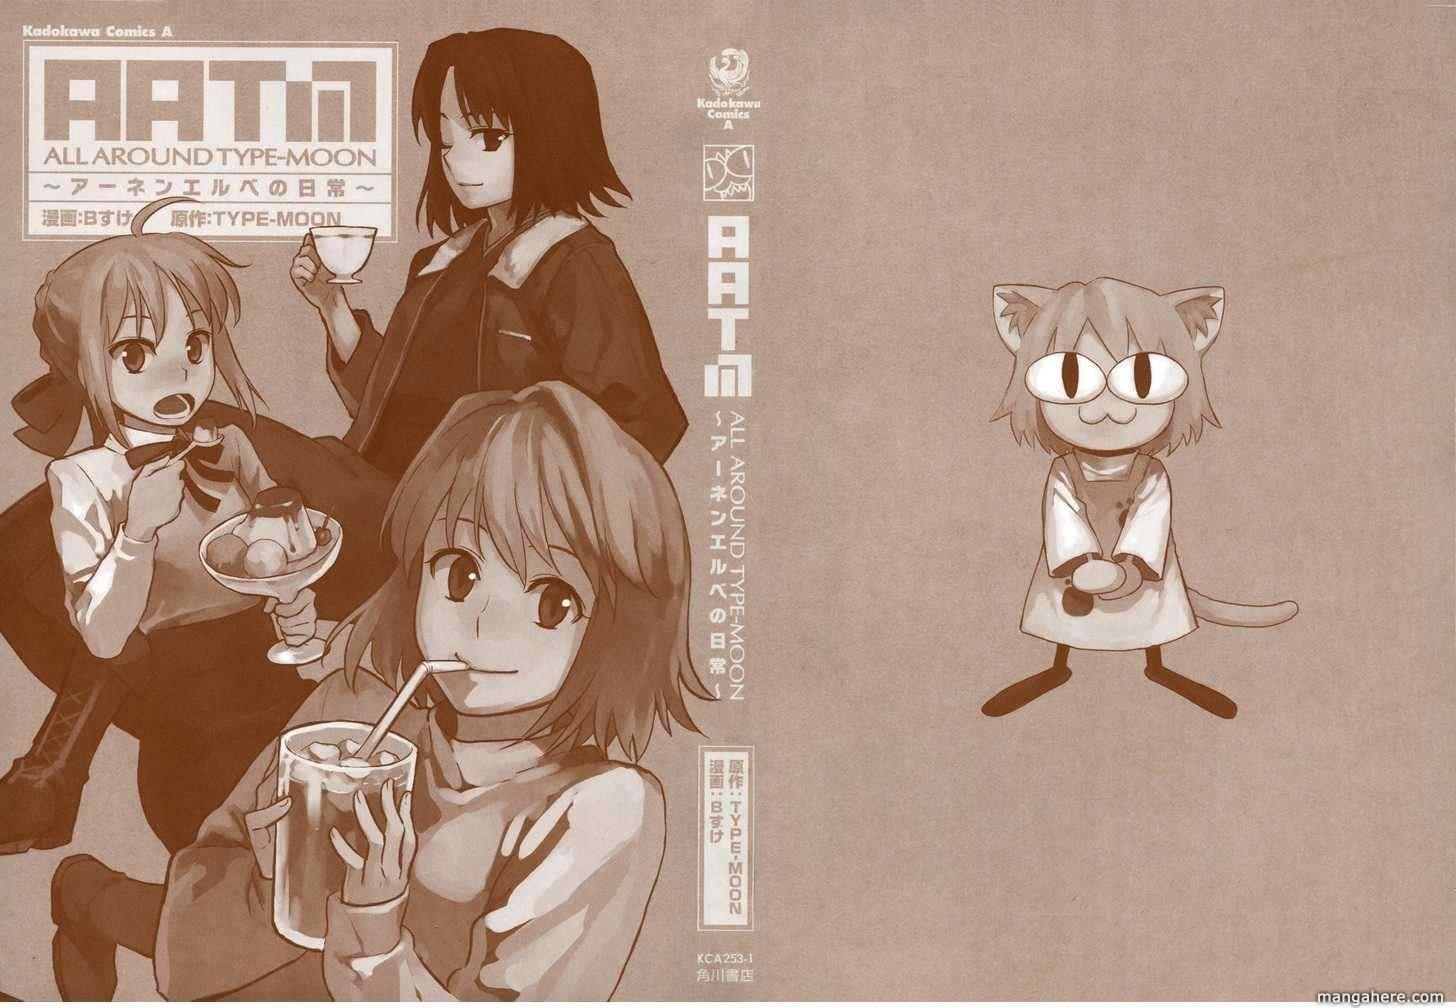 All Around Type-Moon - Ahnenerbe No Nichijou 1 Page 2